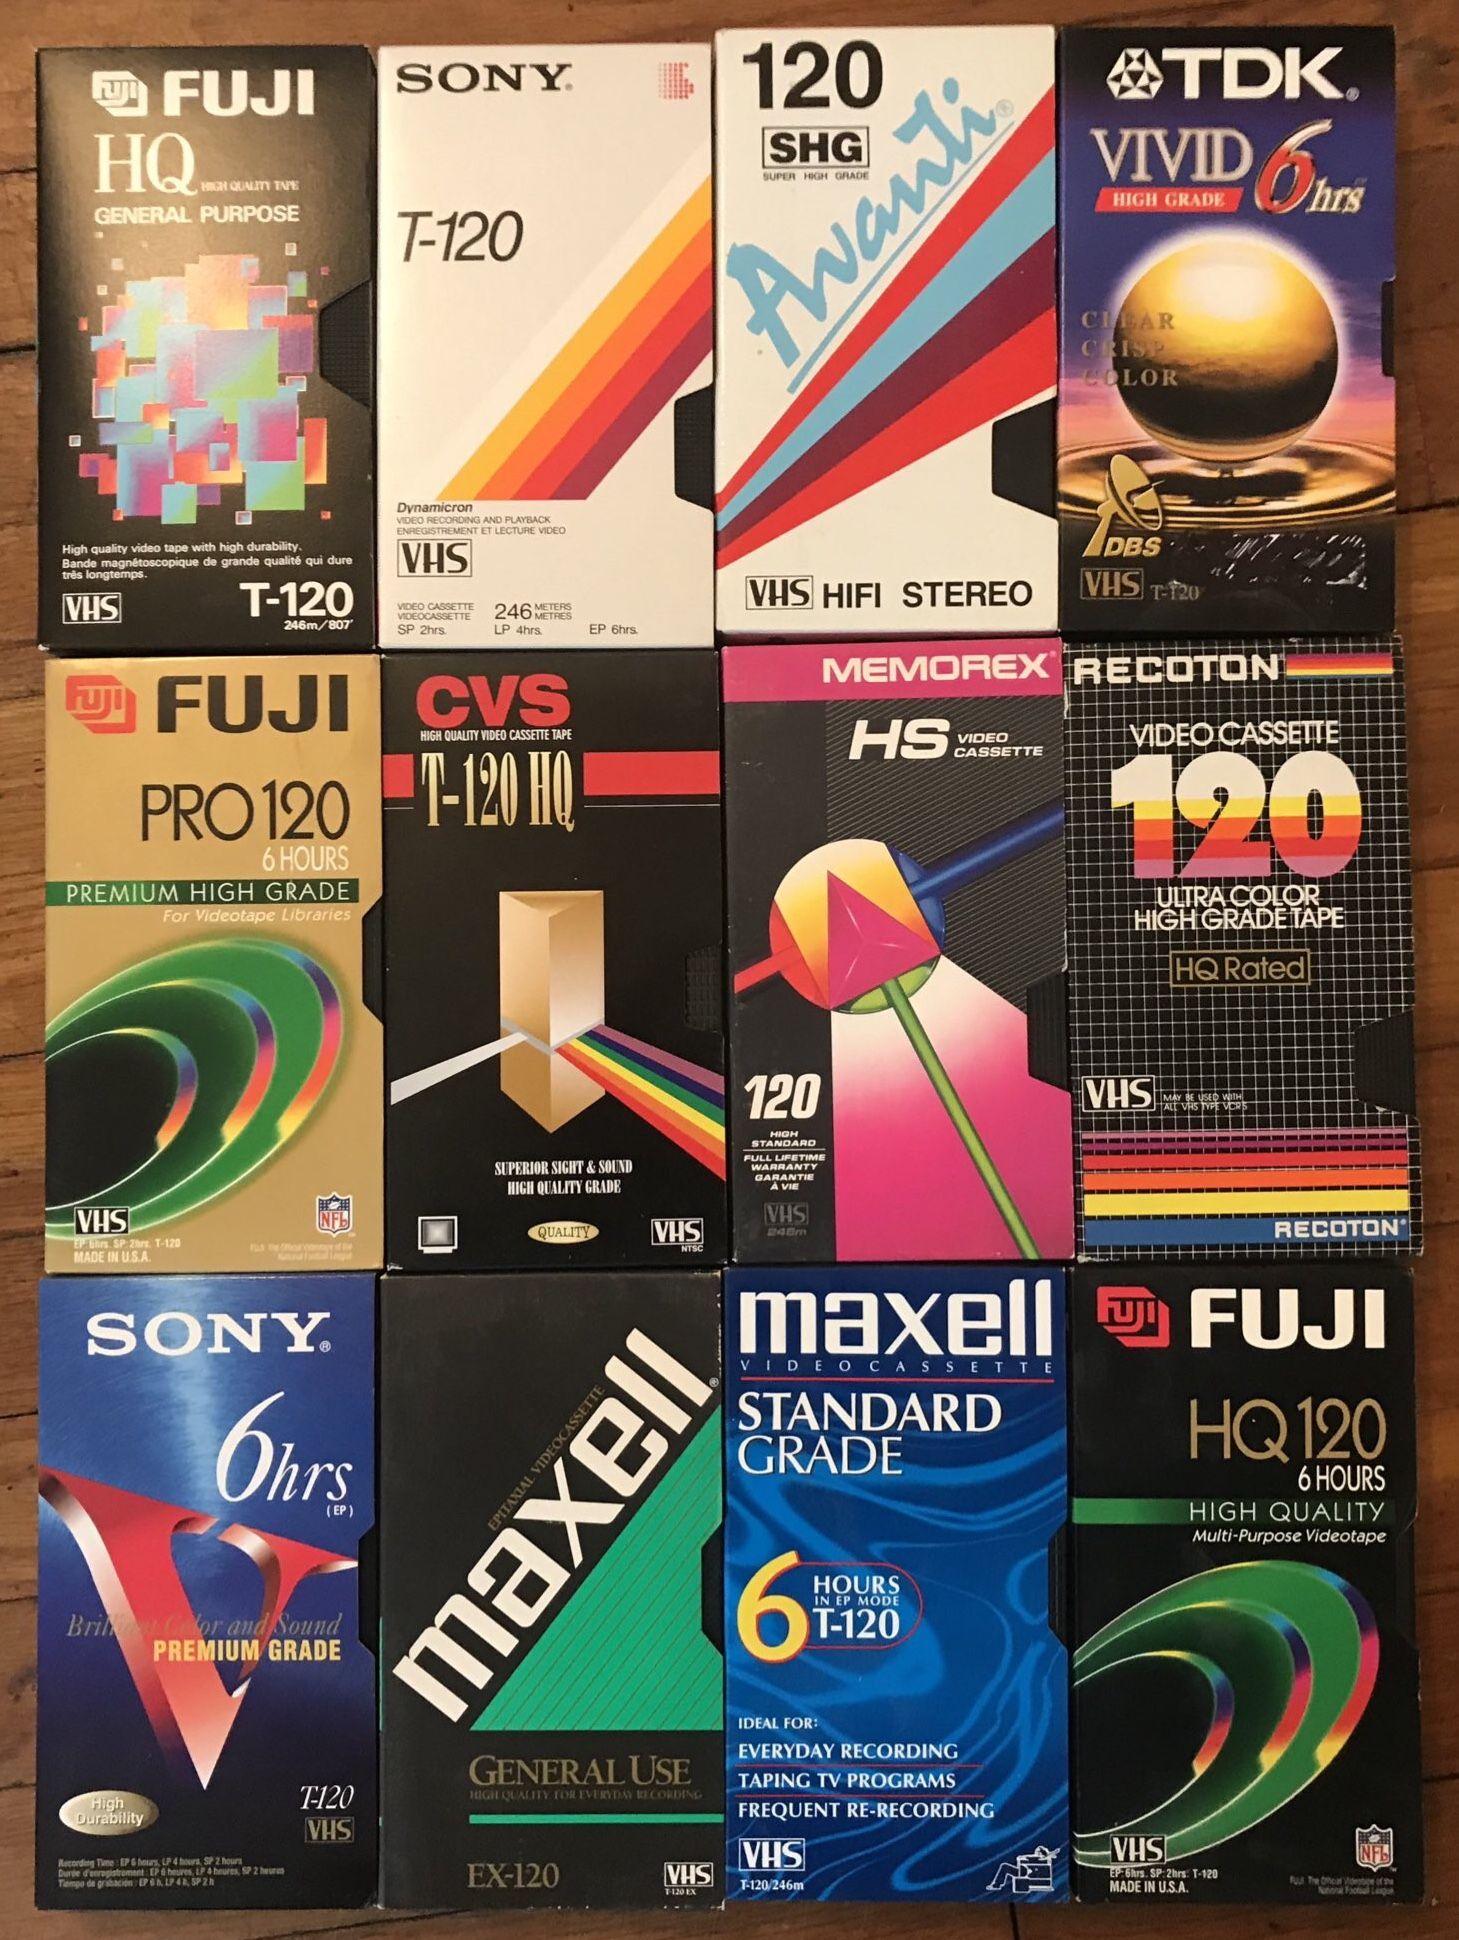 Vhs Tape Covers Packaging Design Trends Vhs Cassette 90s Design